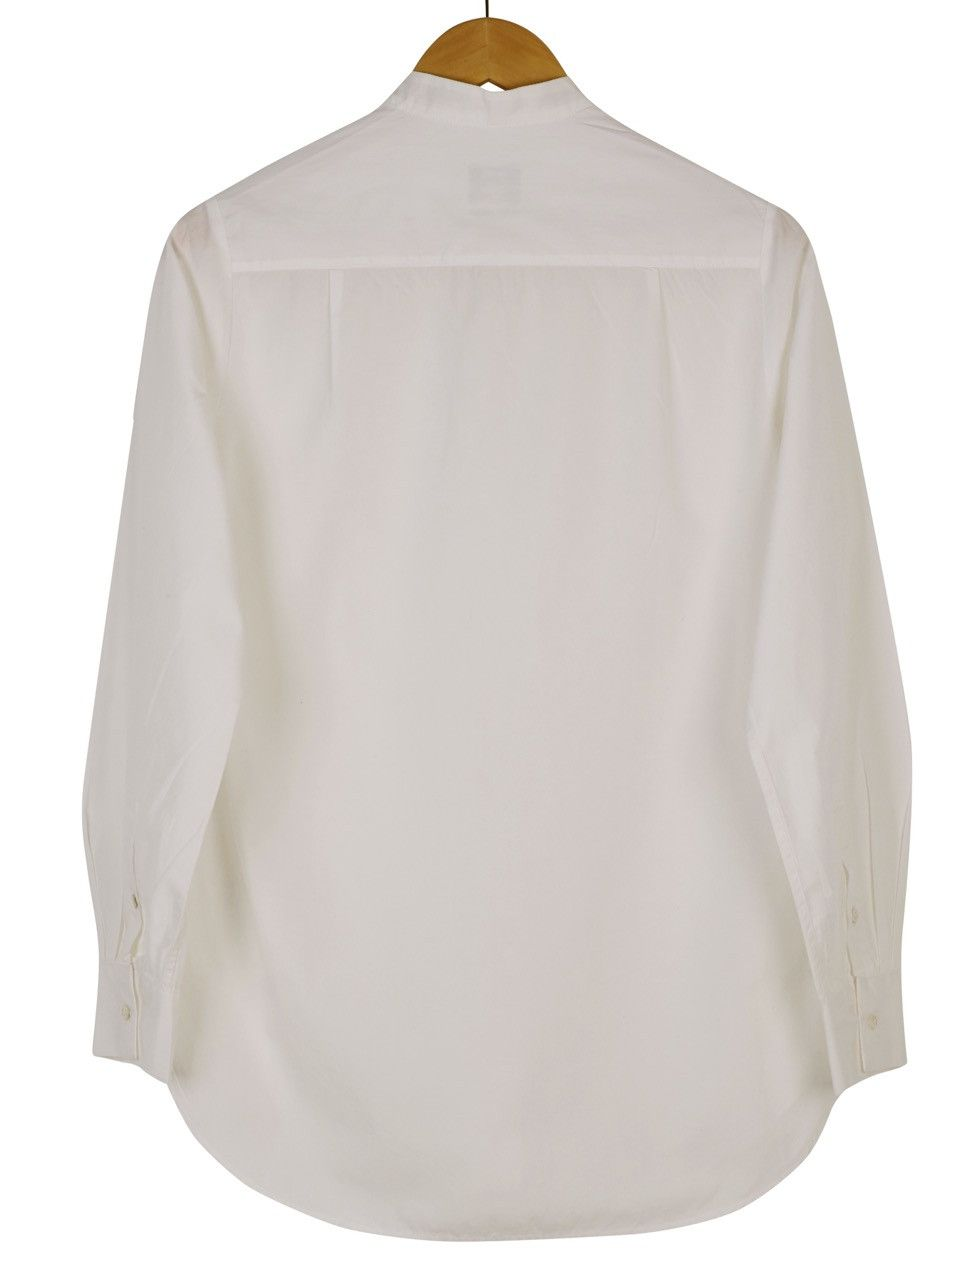 Dress Shirt In White Poplin Dress Shirts Bibs And Cotton